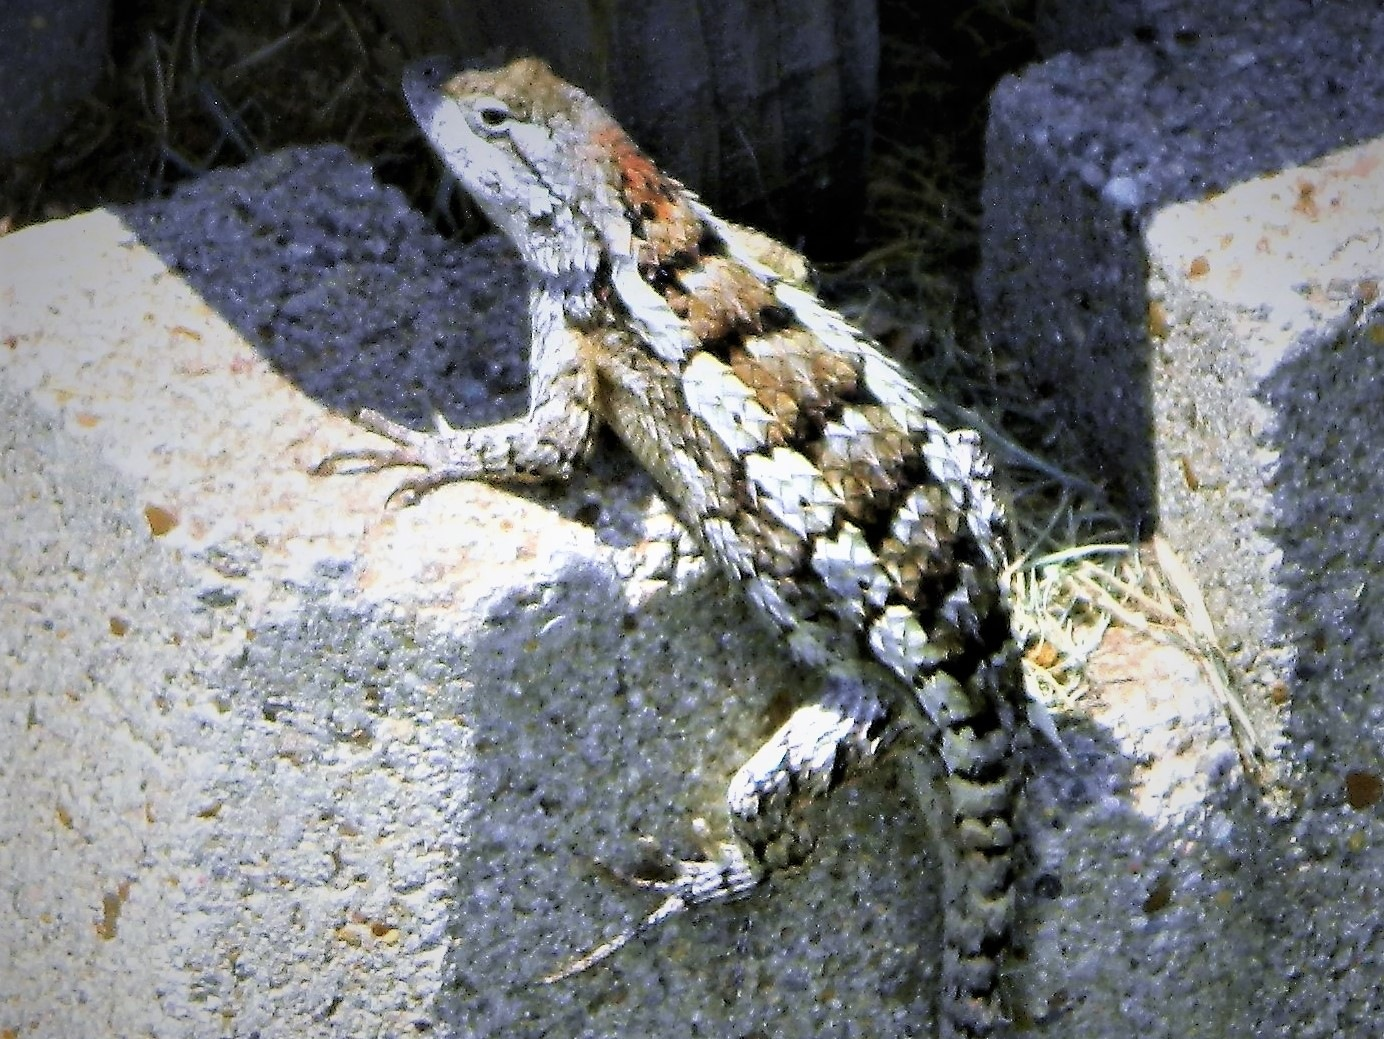 Lizard by getta.stephens